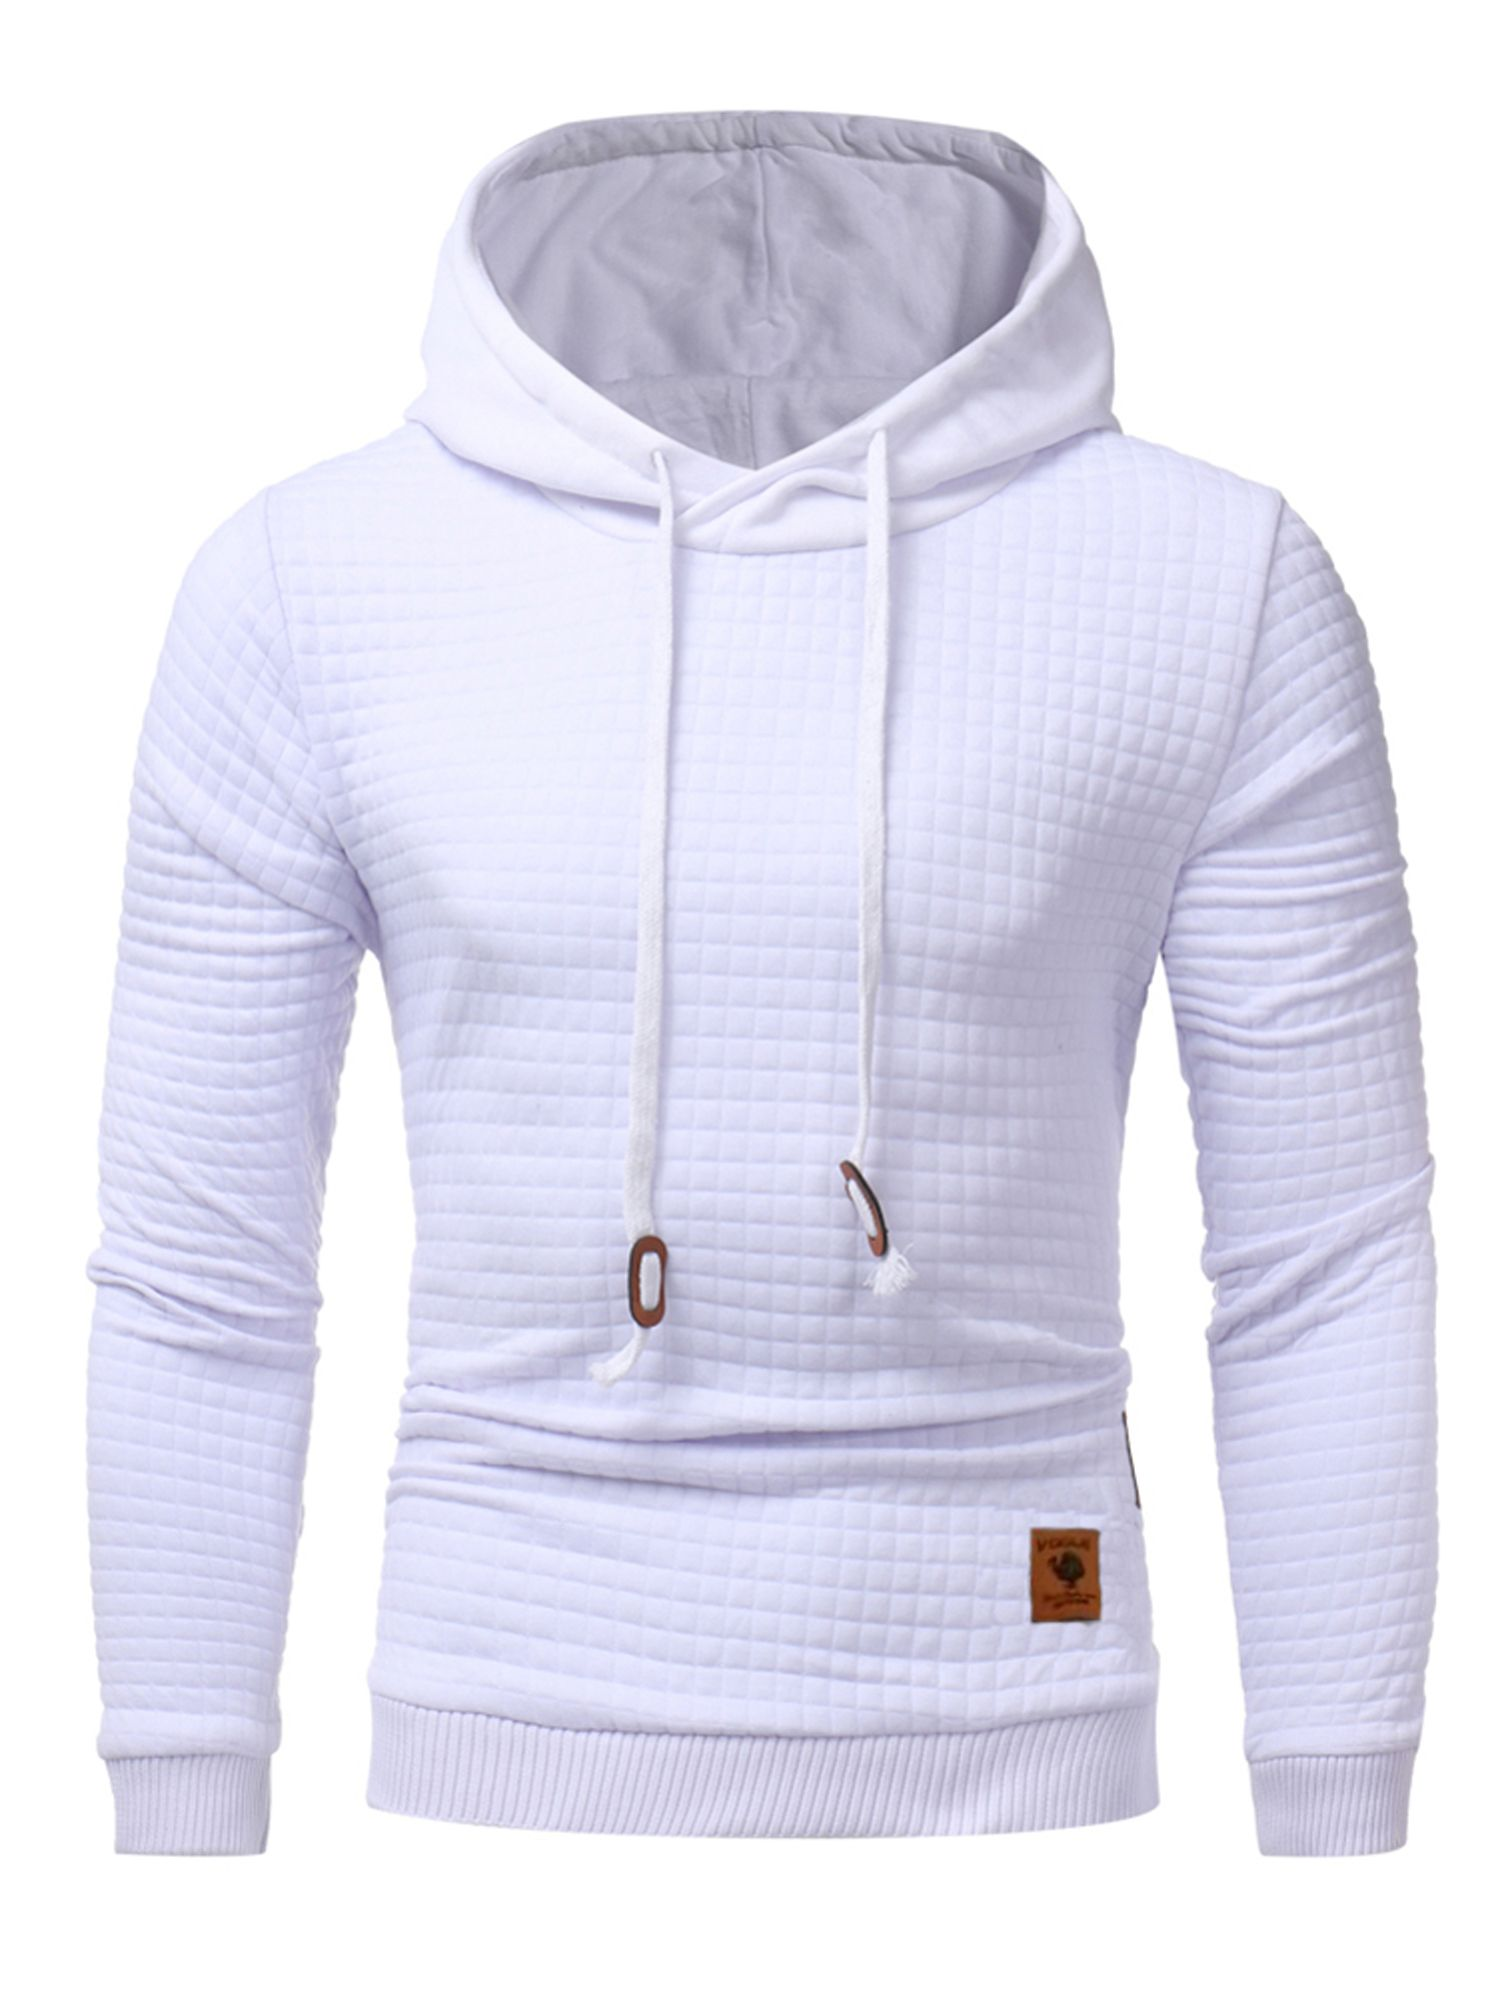 Ma Baby 2020 Autumn Men S Slim Hoodies Pullovers Coats Long Sleeve Sportswear Hoodies Men Hooded Sweatshirt Men Hooded Sweatshirts [ 2000 x 1500 Pixel ]